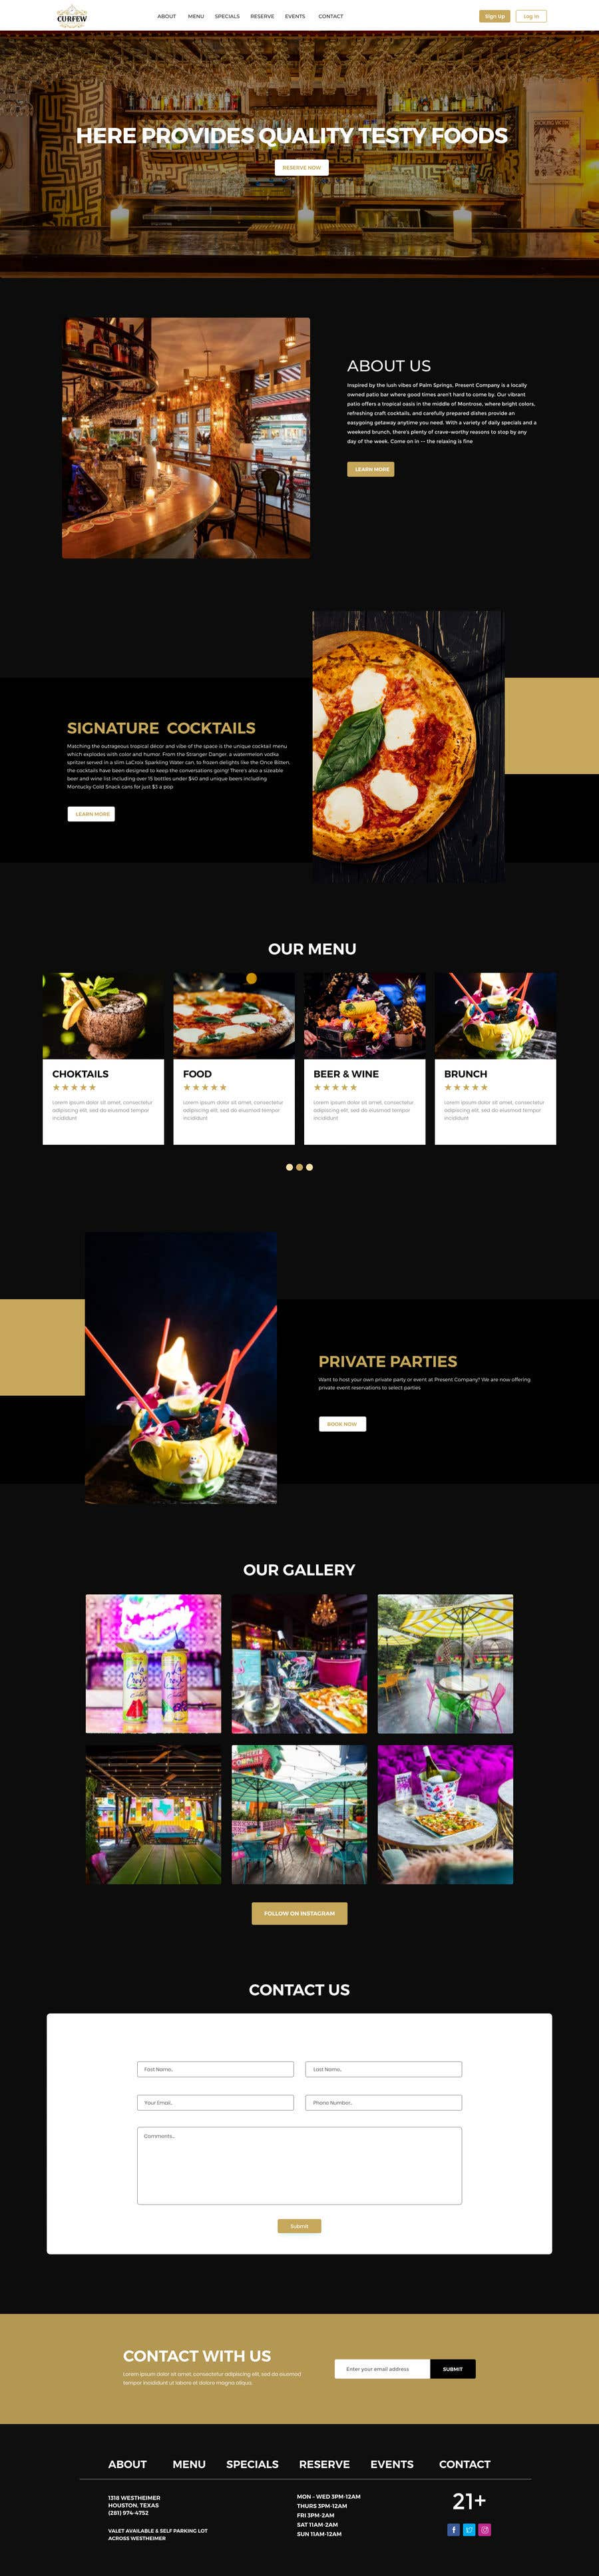 Contest Entry #                                        158                                      for                                         Design FUN Website for Speakeasy Concept